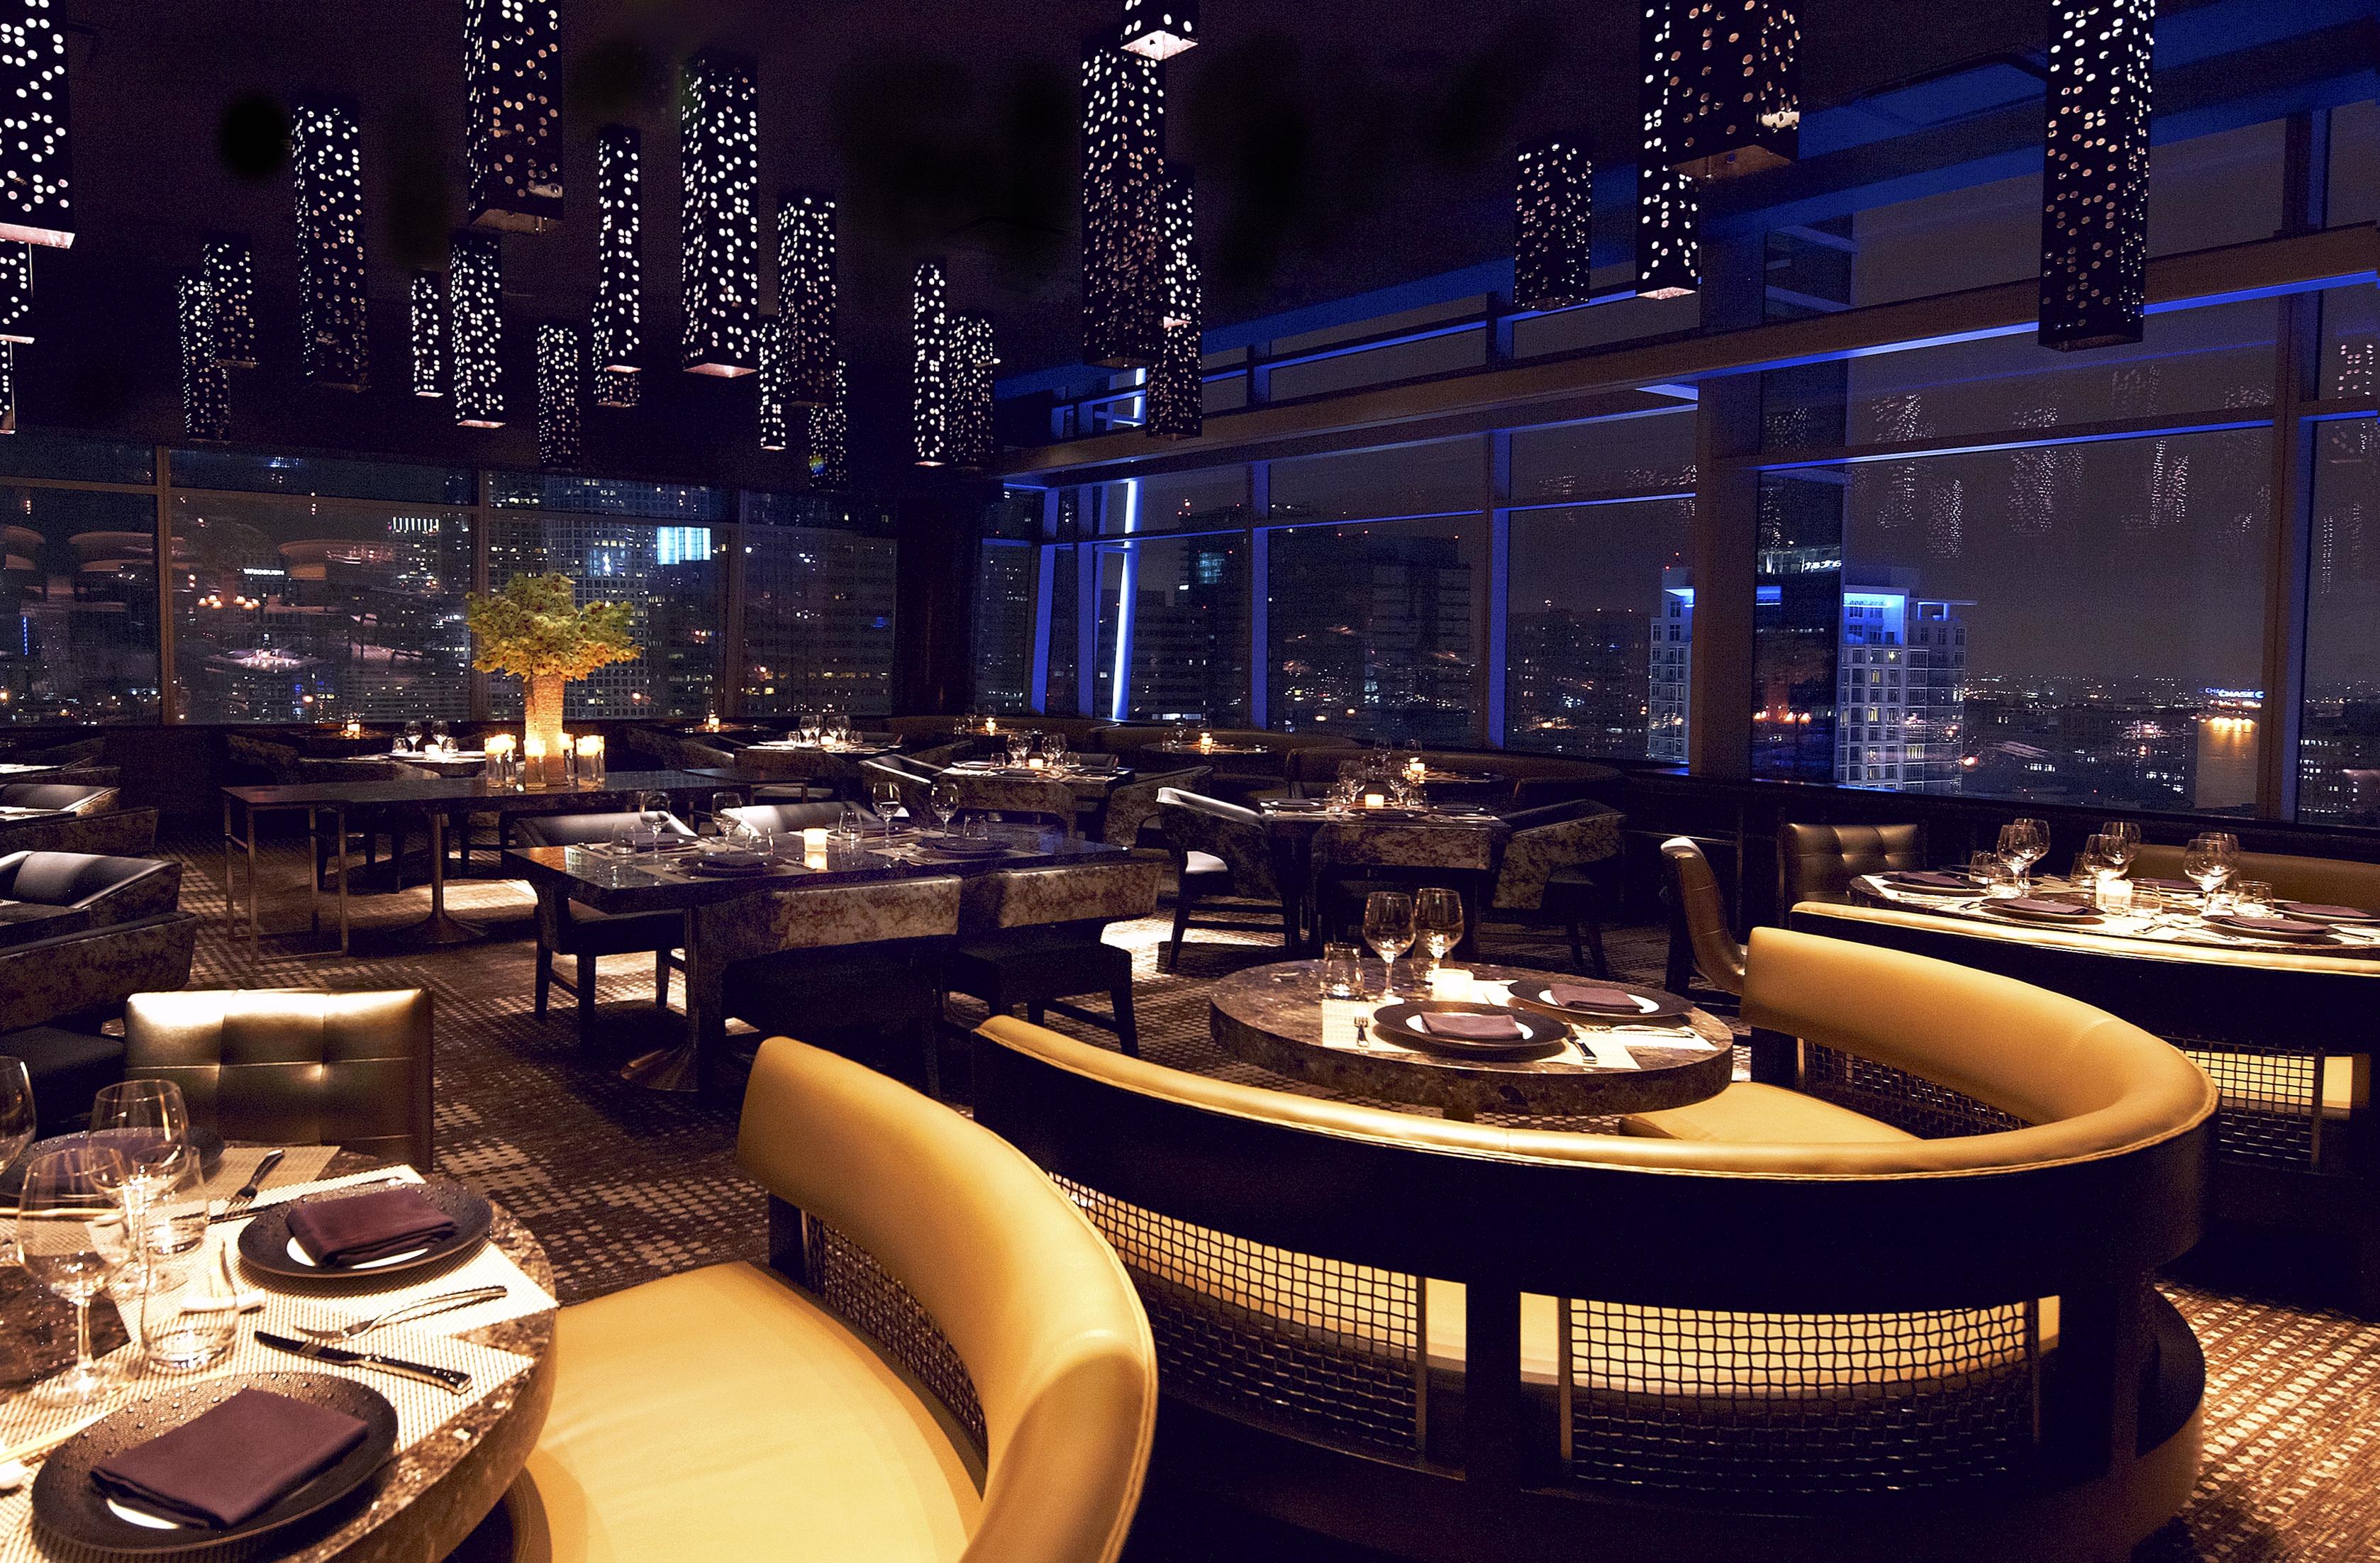 The Divine Dish Dinner at WP24 Ritz Carlton LA Live